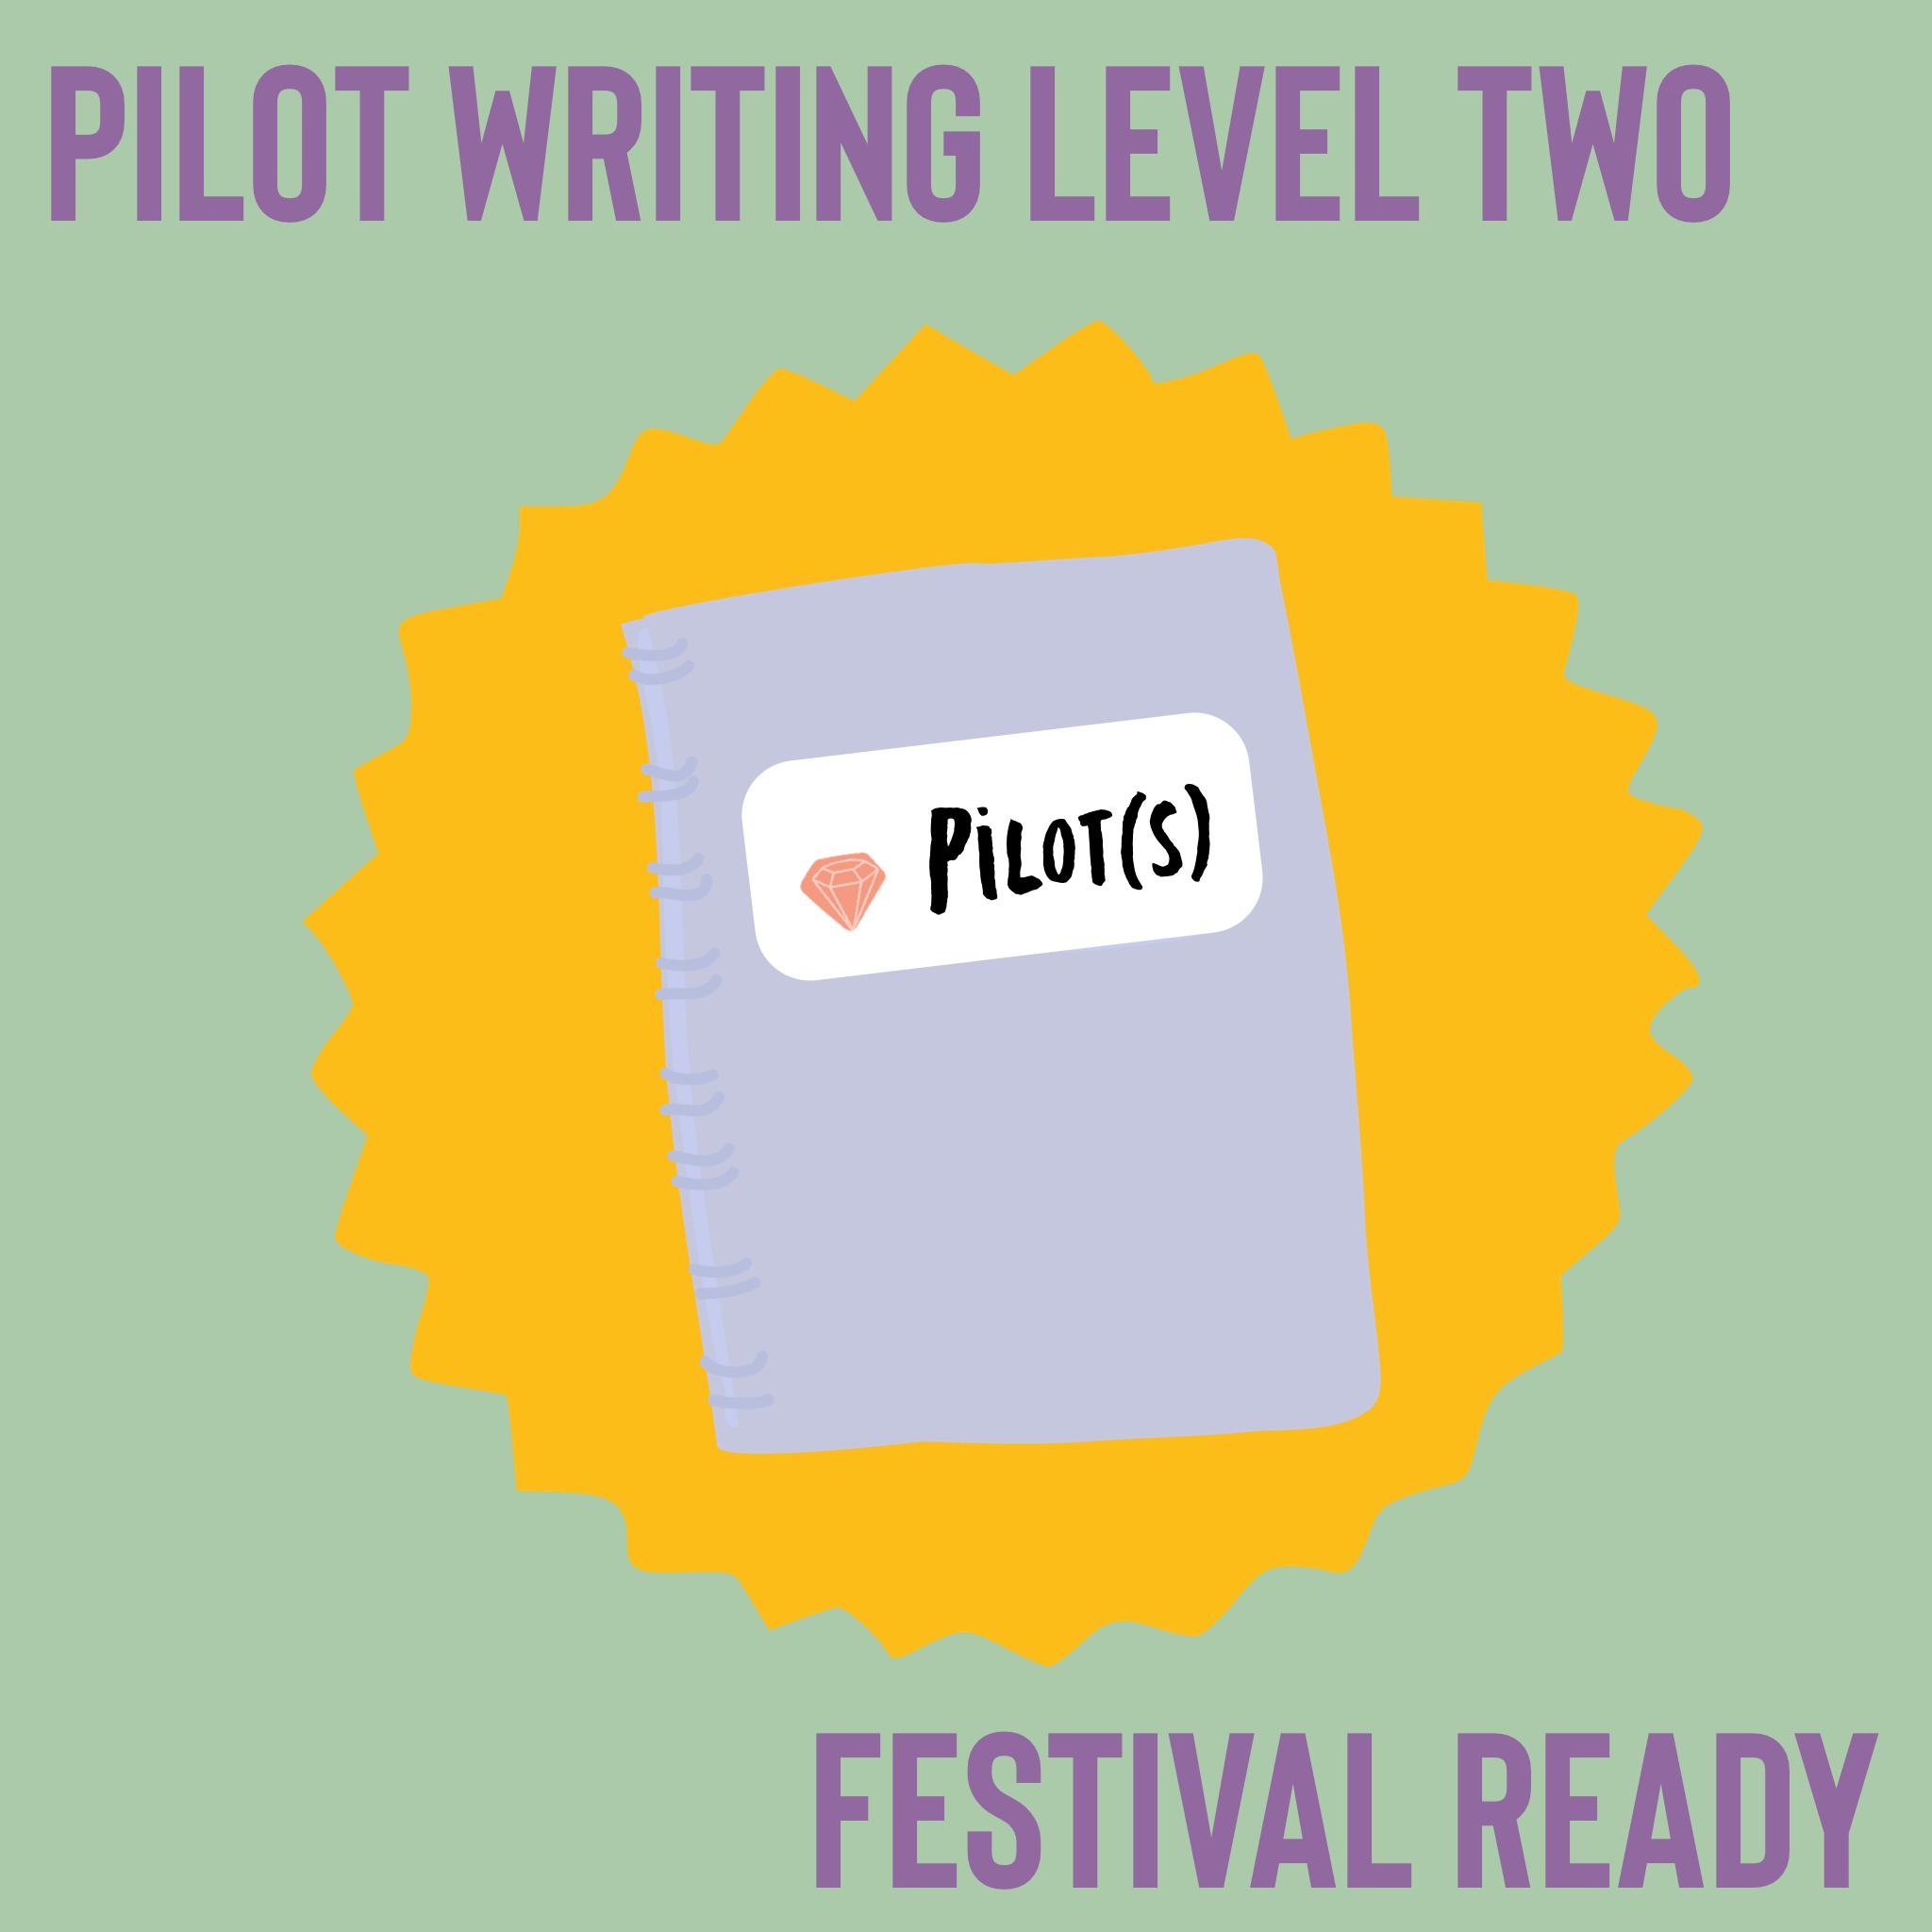 pilot writing level 2